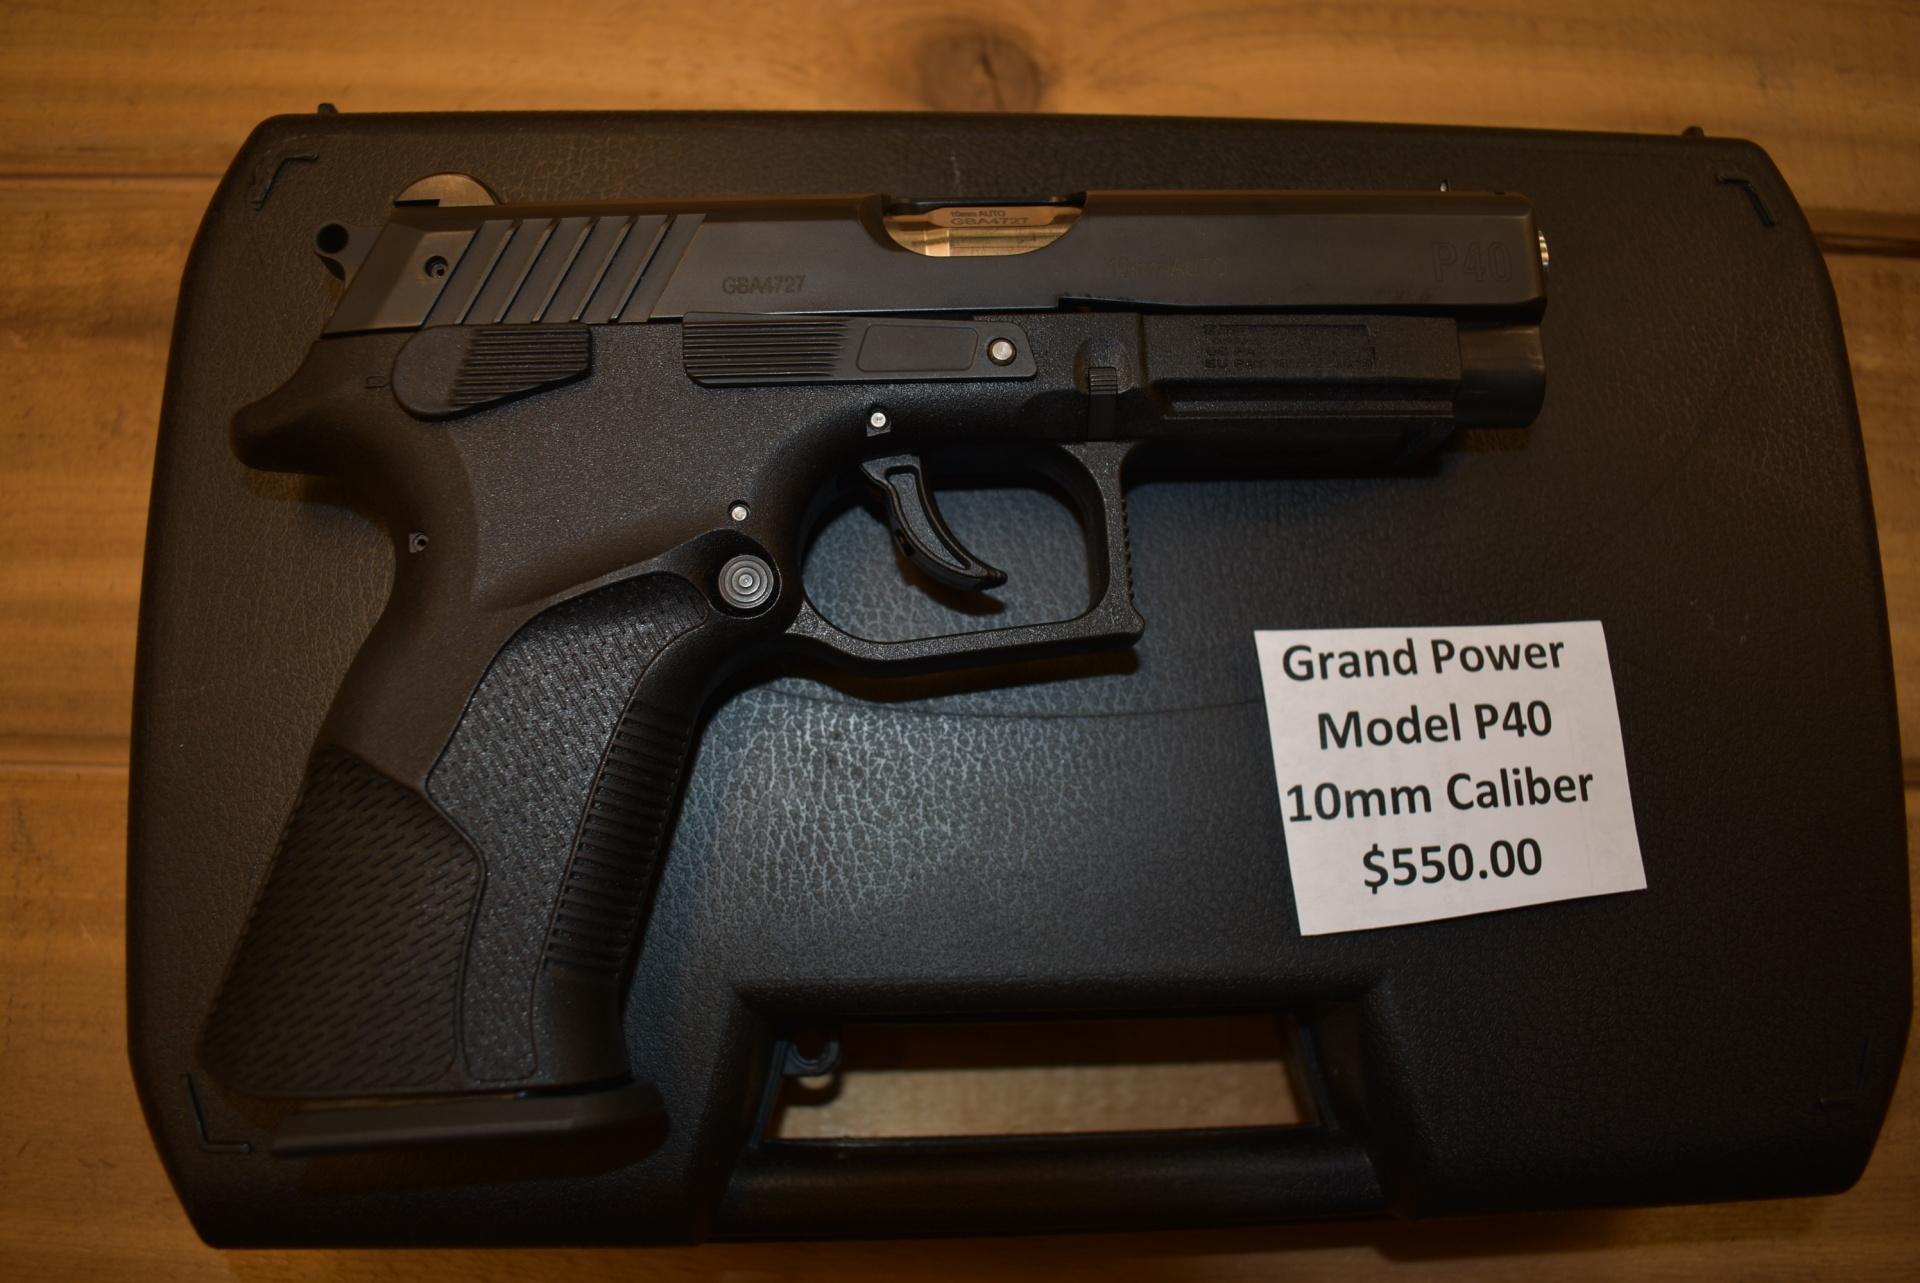 Grand Power 10mm